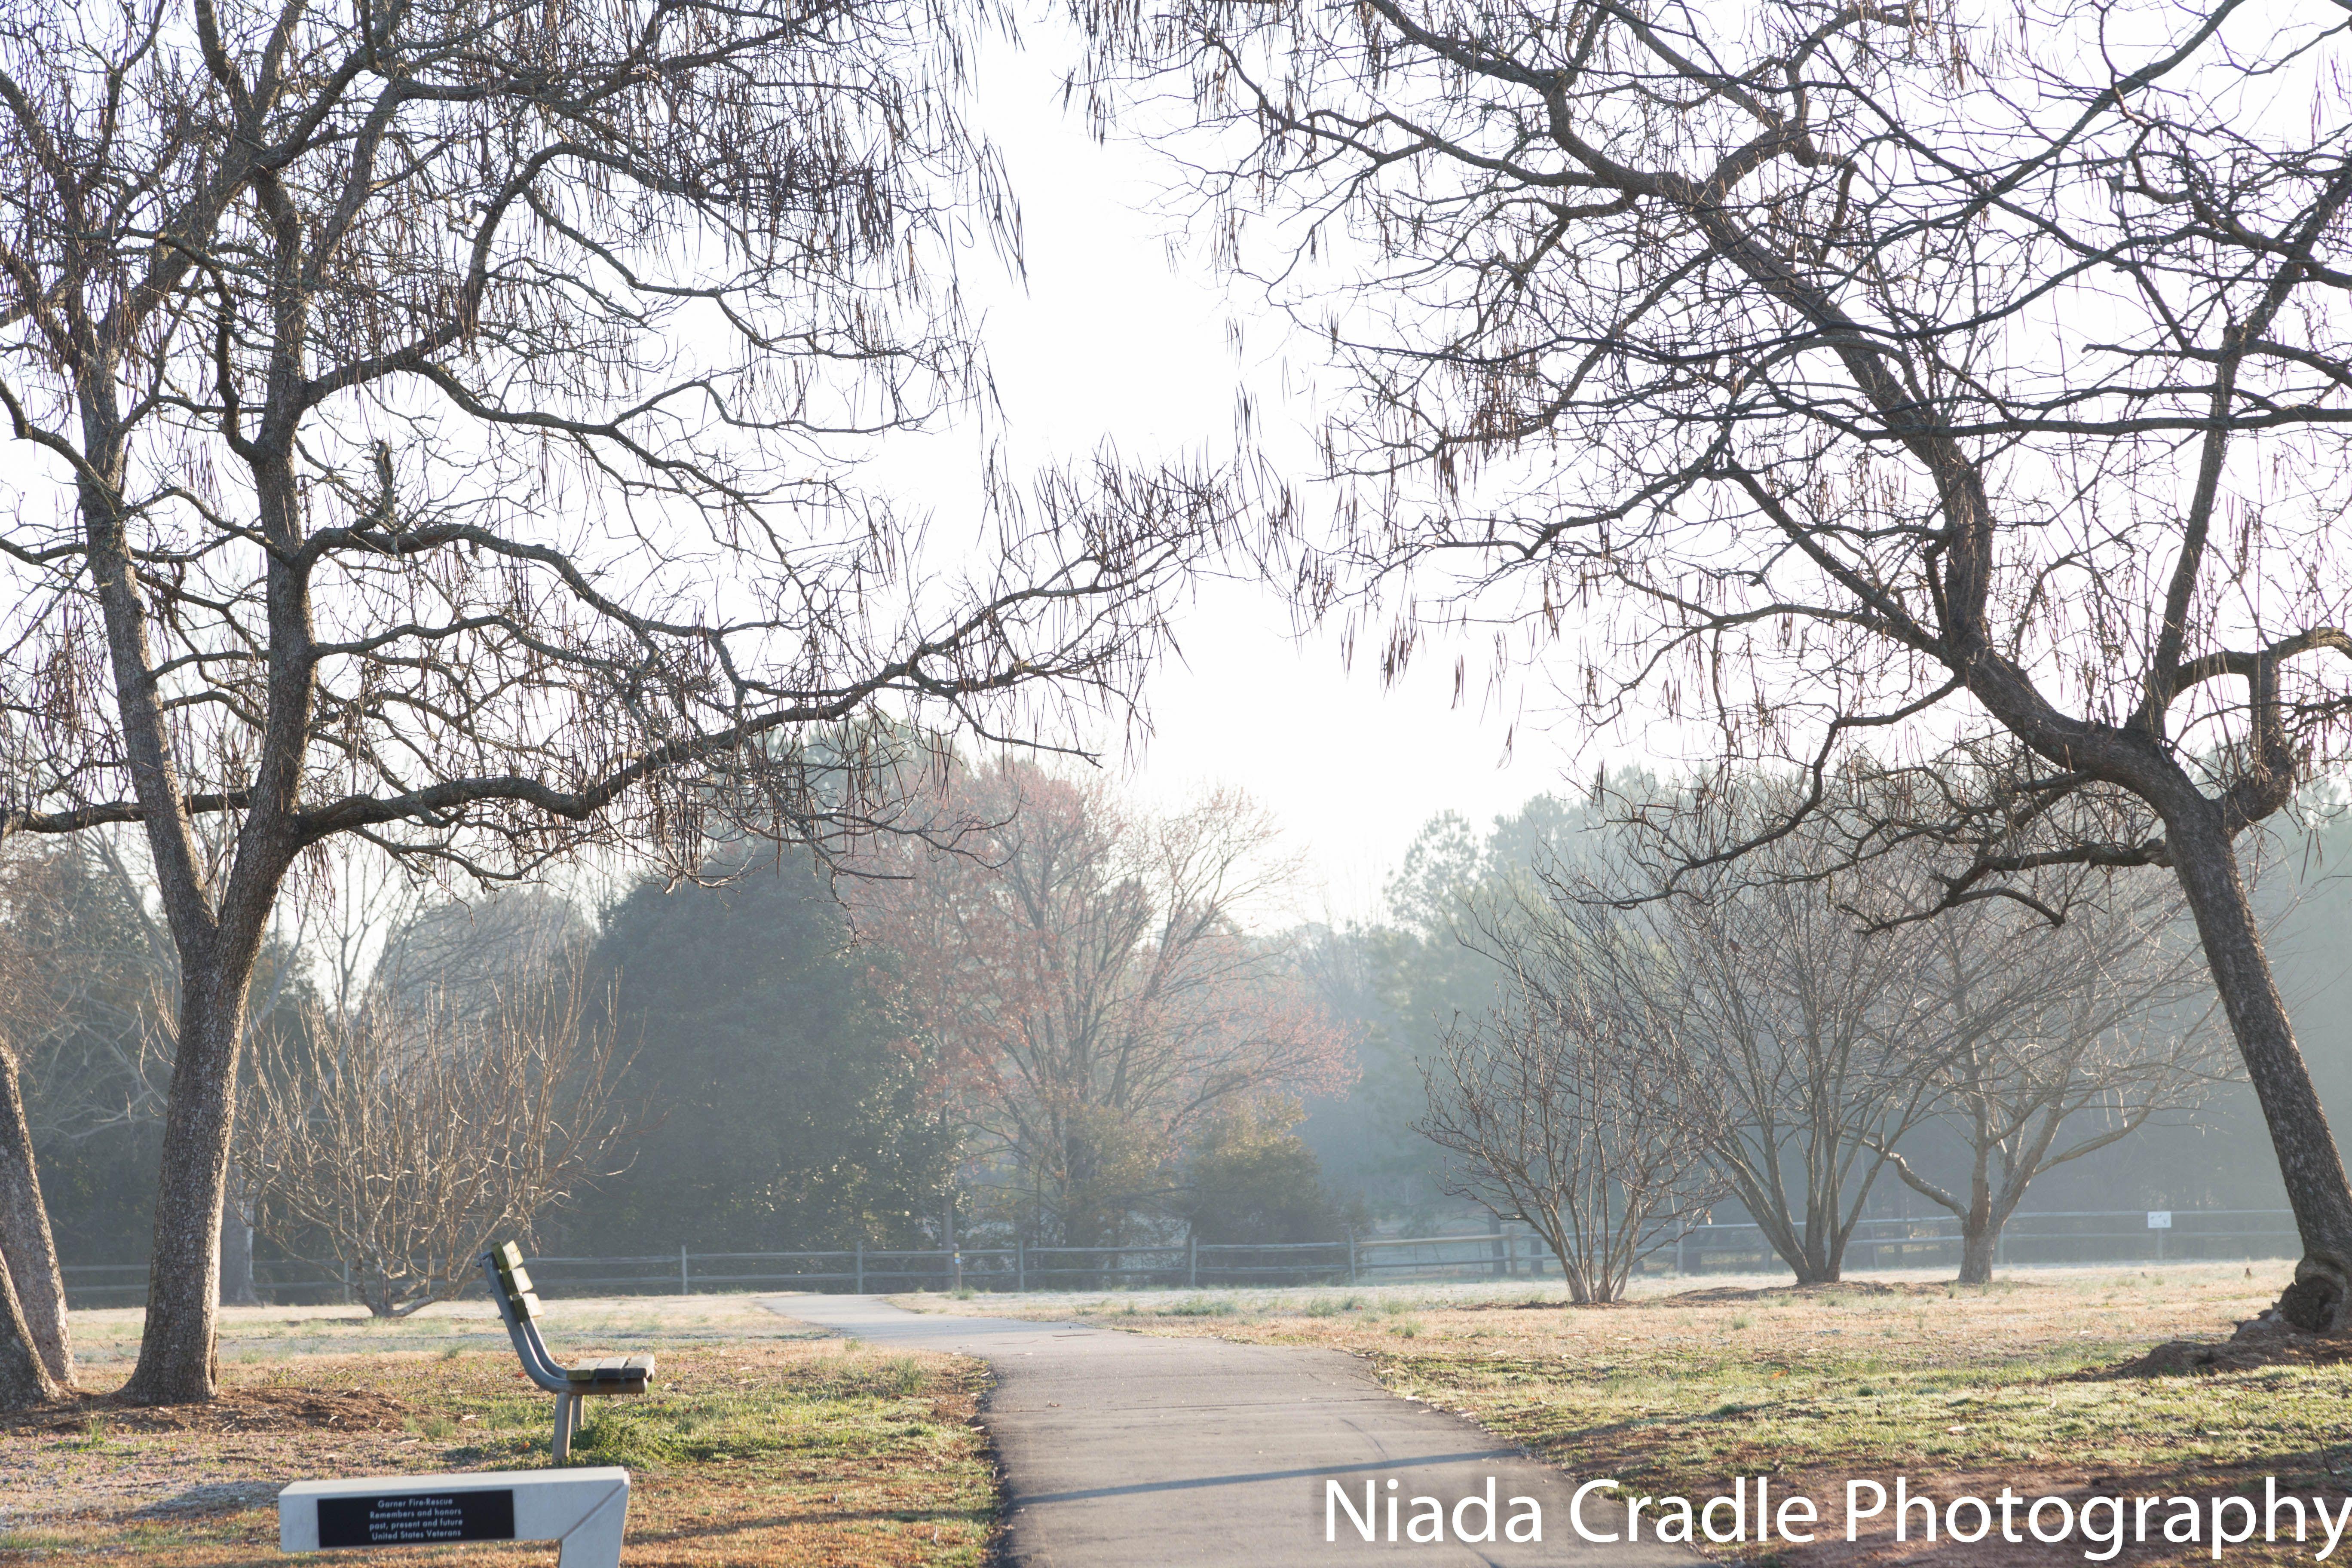 Road less traveled at Memorial park in North Carolina #roadlesstraveled #nature #niadacradlephotography